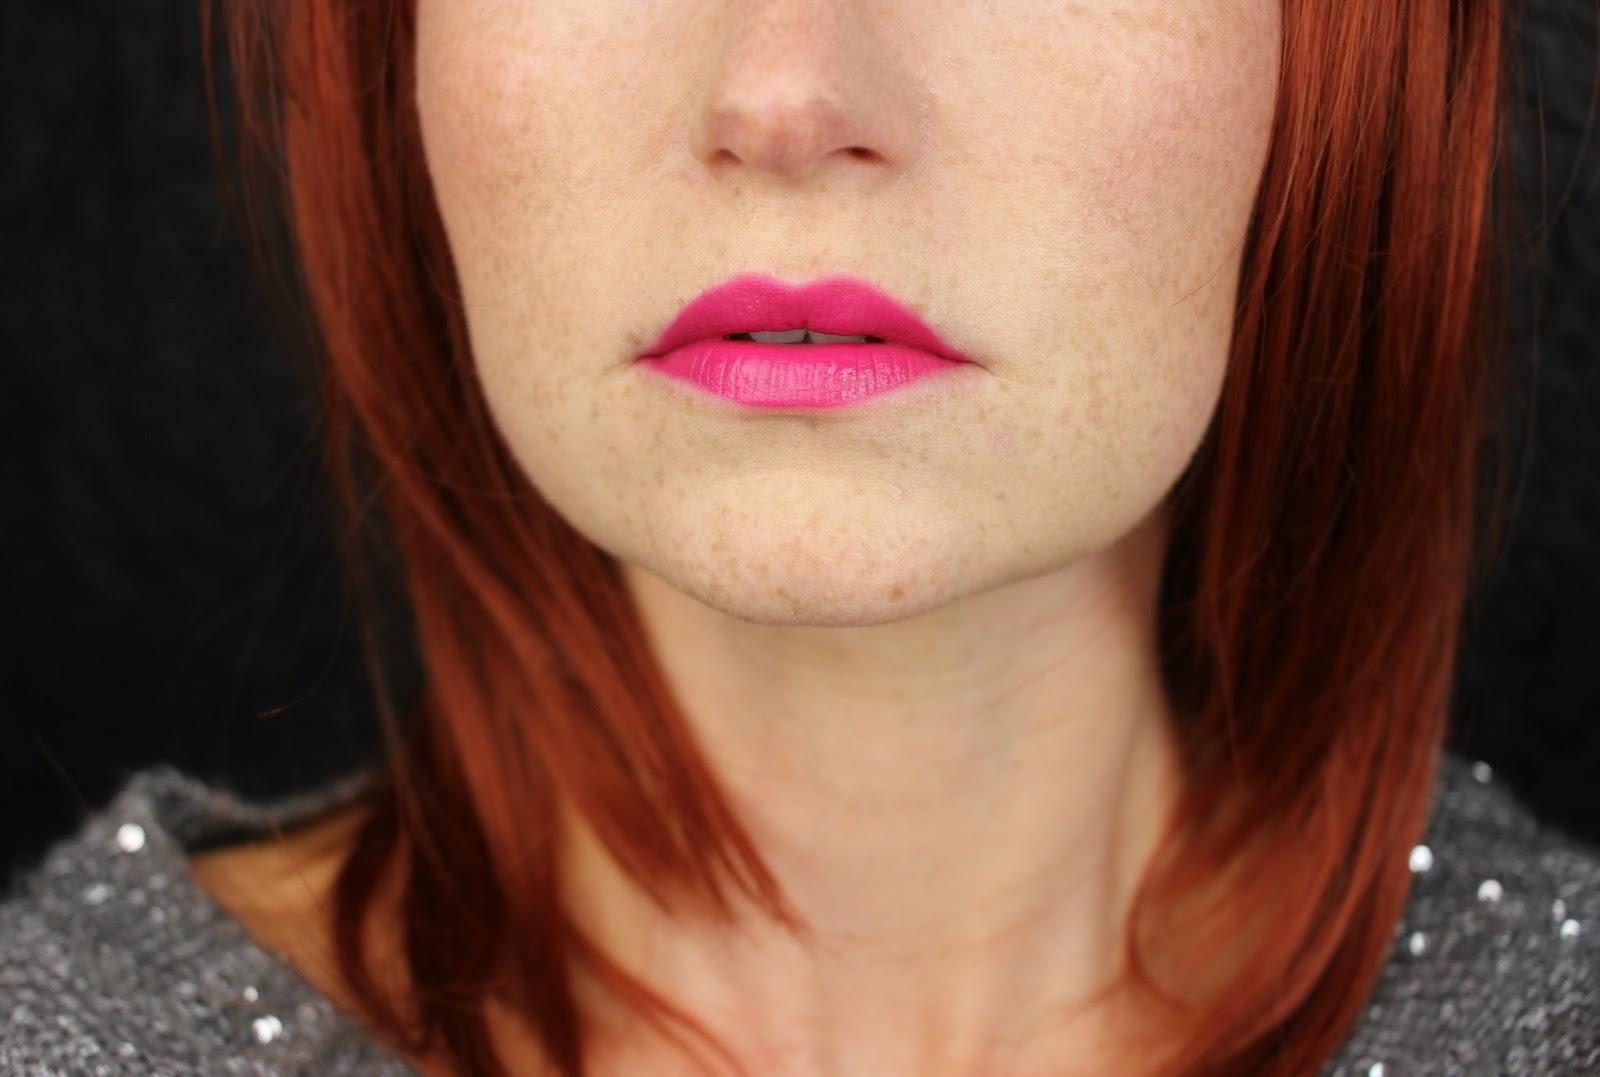 beauty blogger, cosmetics, deutschland, drogerie, farbtrends, lippenstift, liquid lipstick, mattes finish, review, revlon, rossmann, rote lippen, swatch party, swatches, tragebilder, Ultra HD Matte Lipcolor,